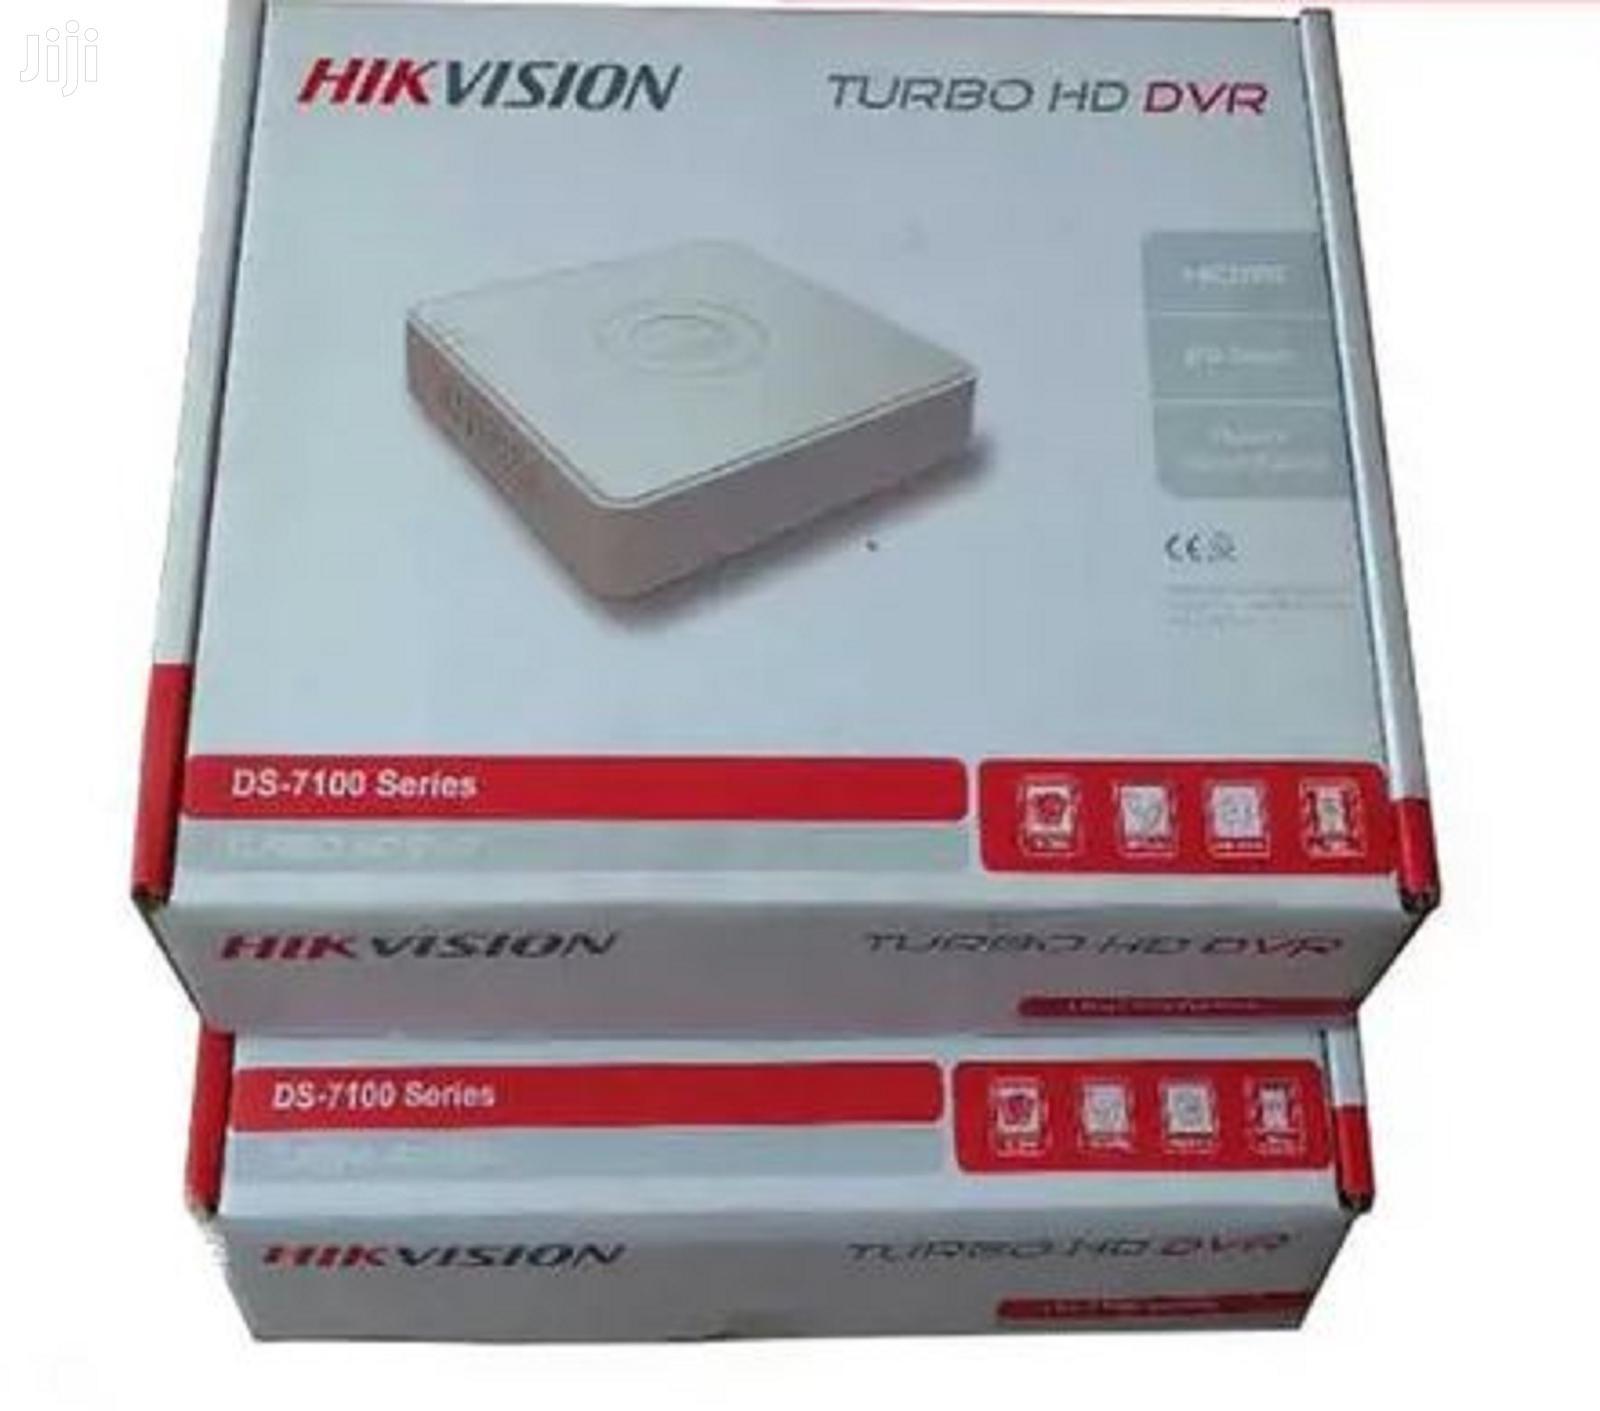 Archive: Hikvision Turbo HD 4 Channel DVR Machine